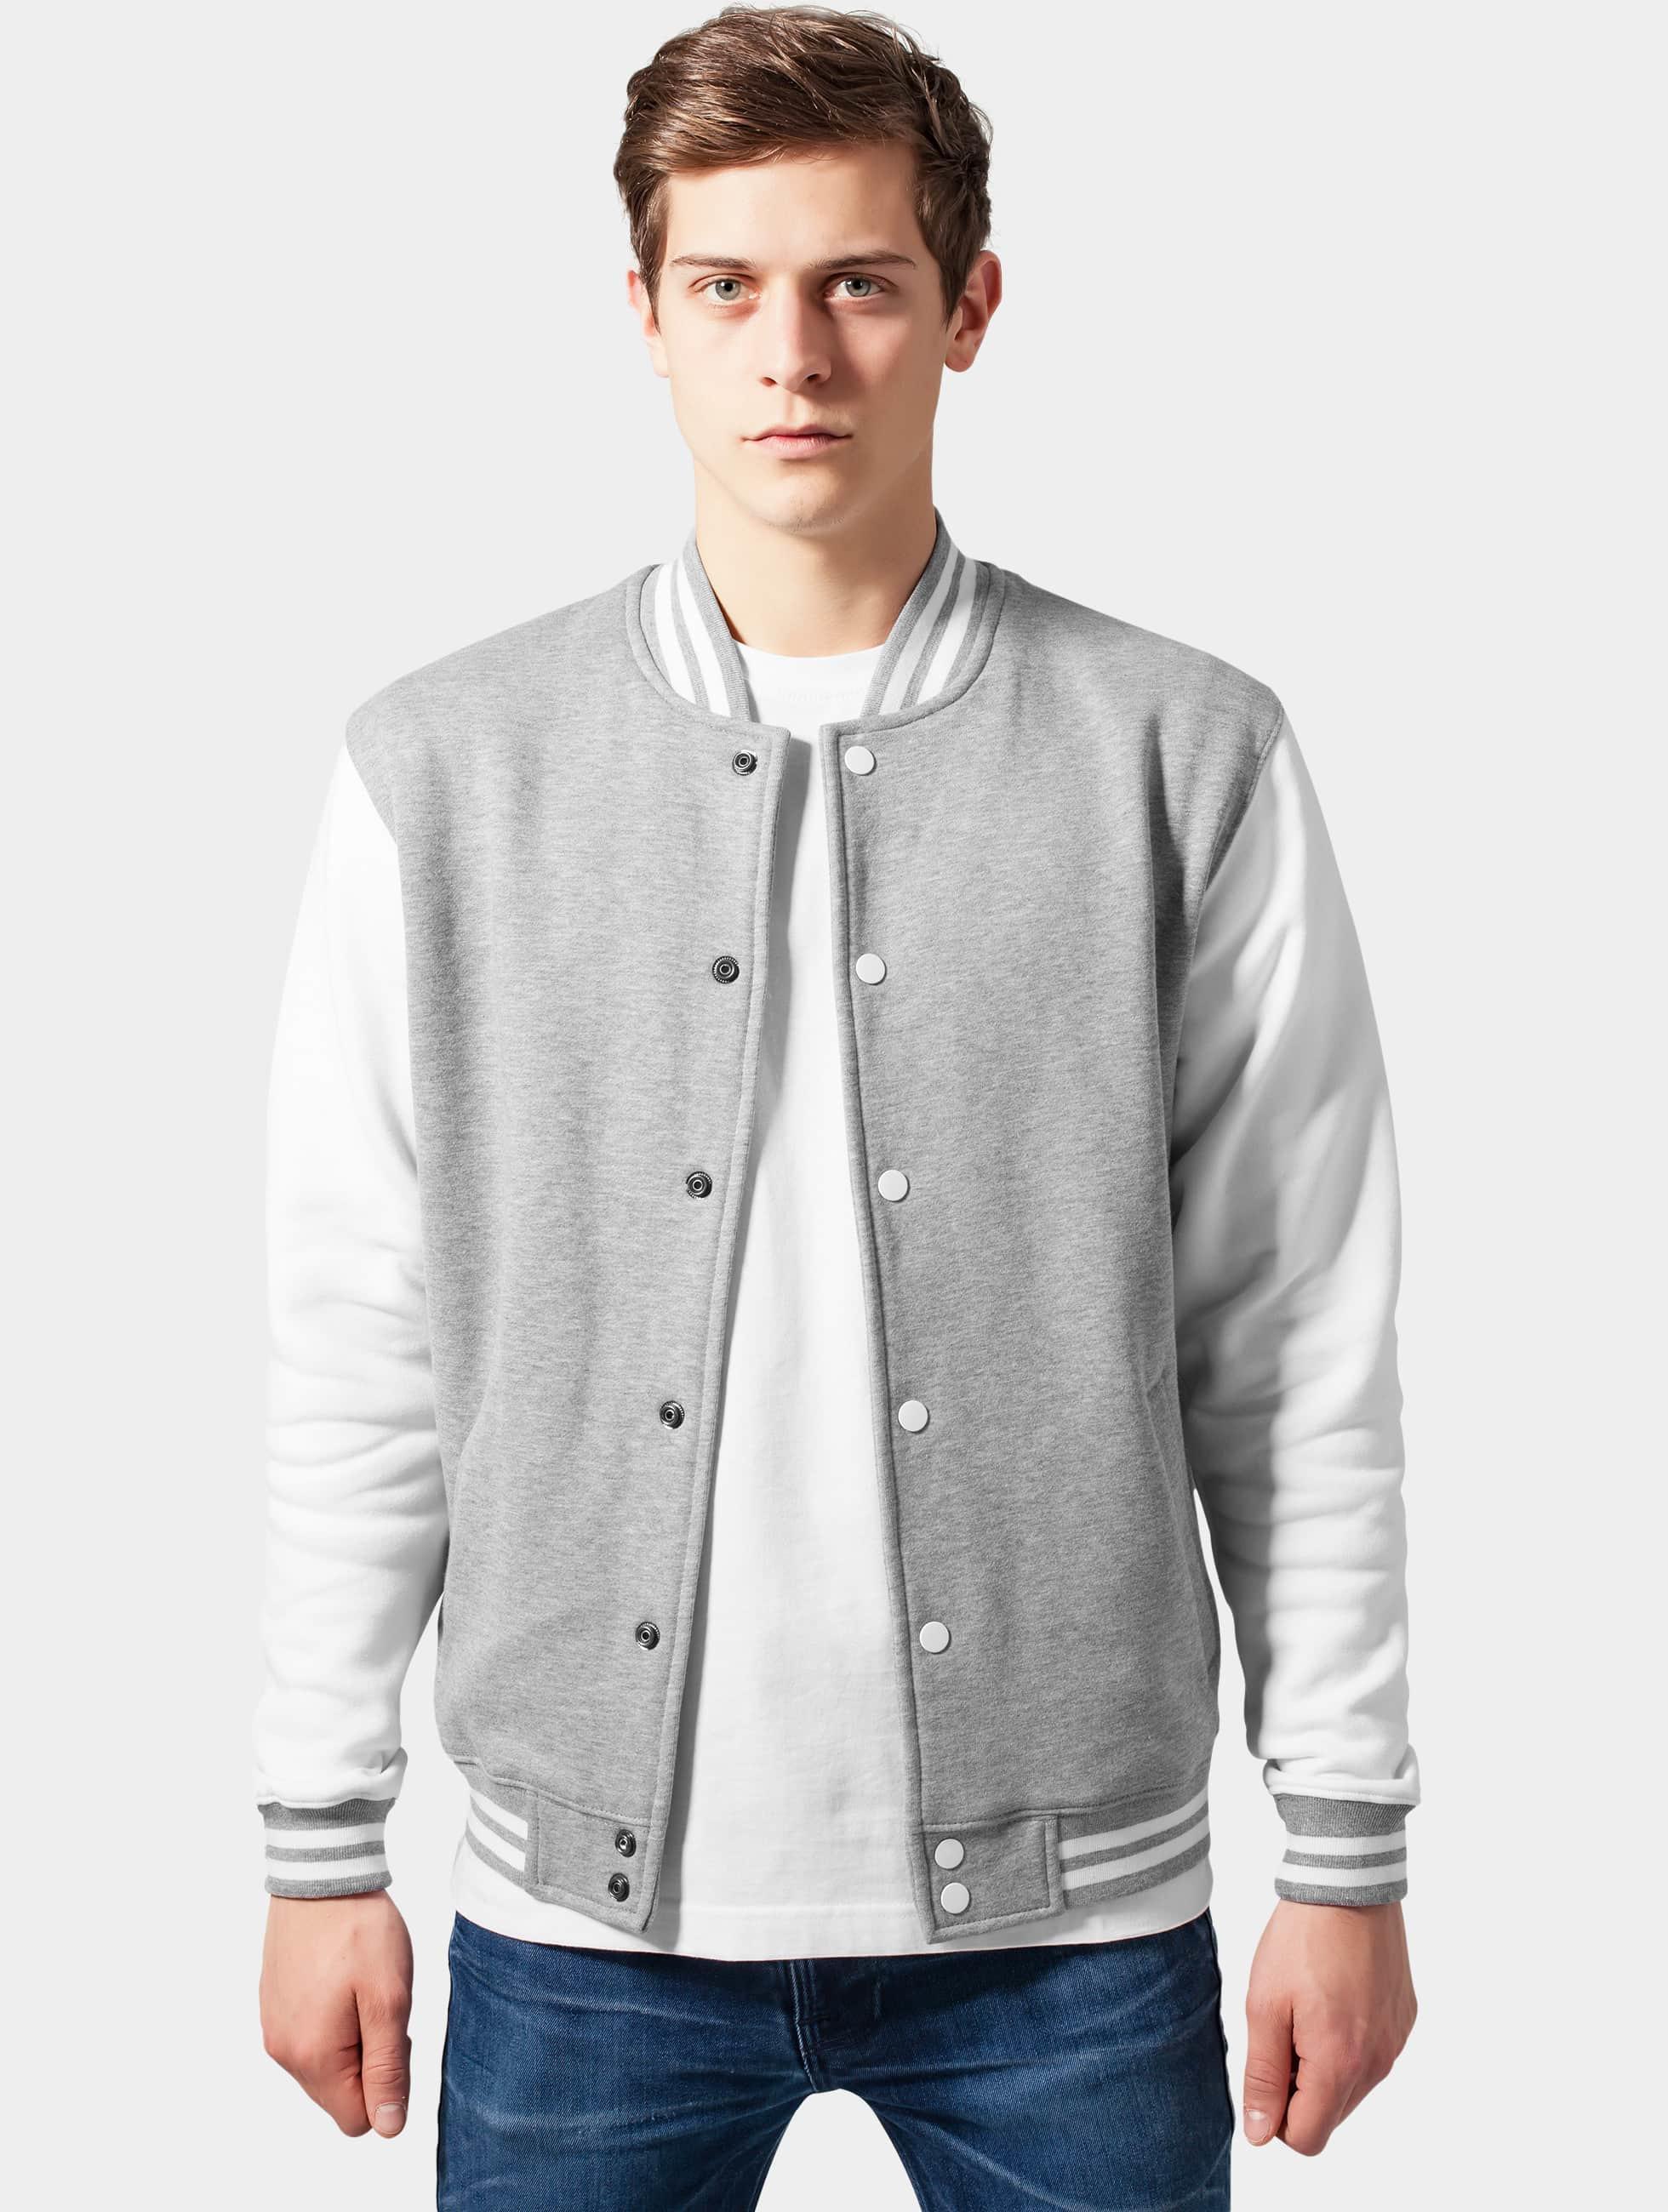 Urban Classics Teddy 2-Tone College Sweatjacket gris